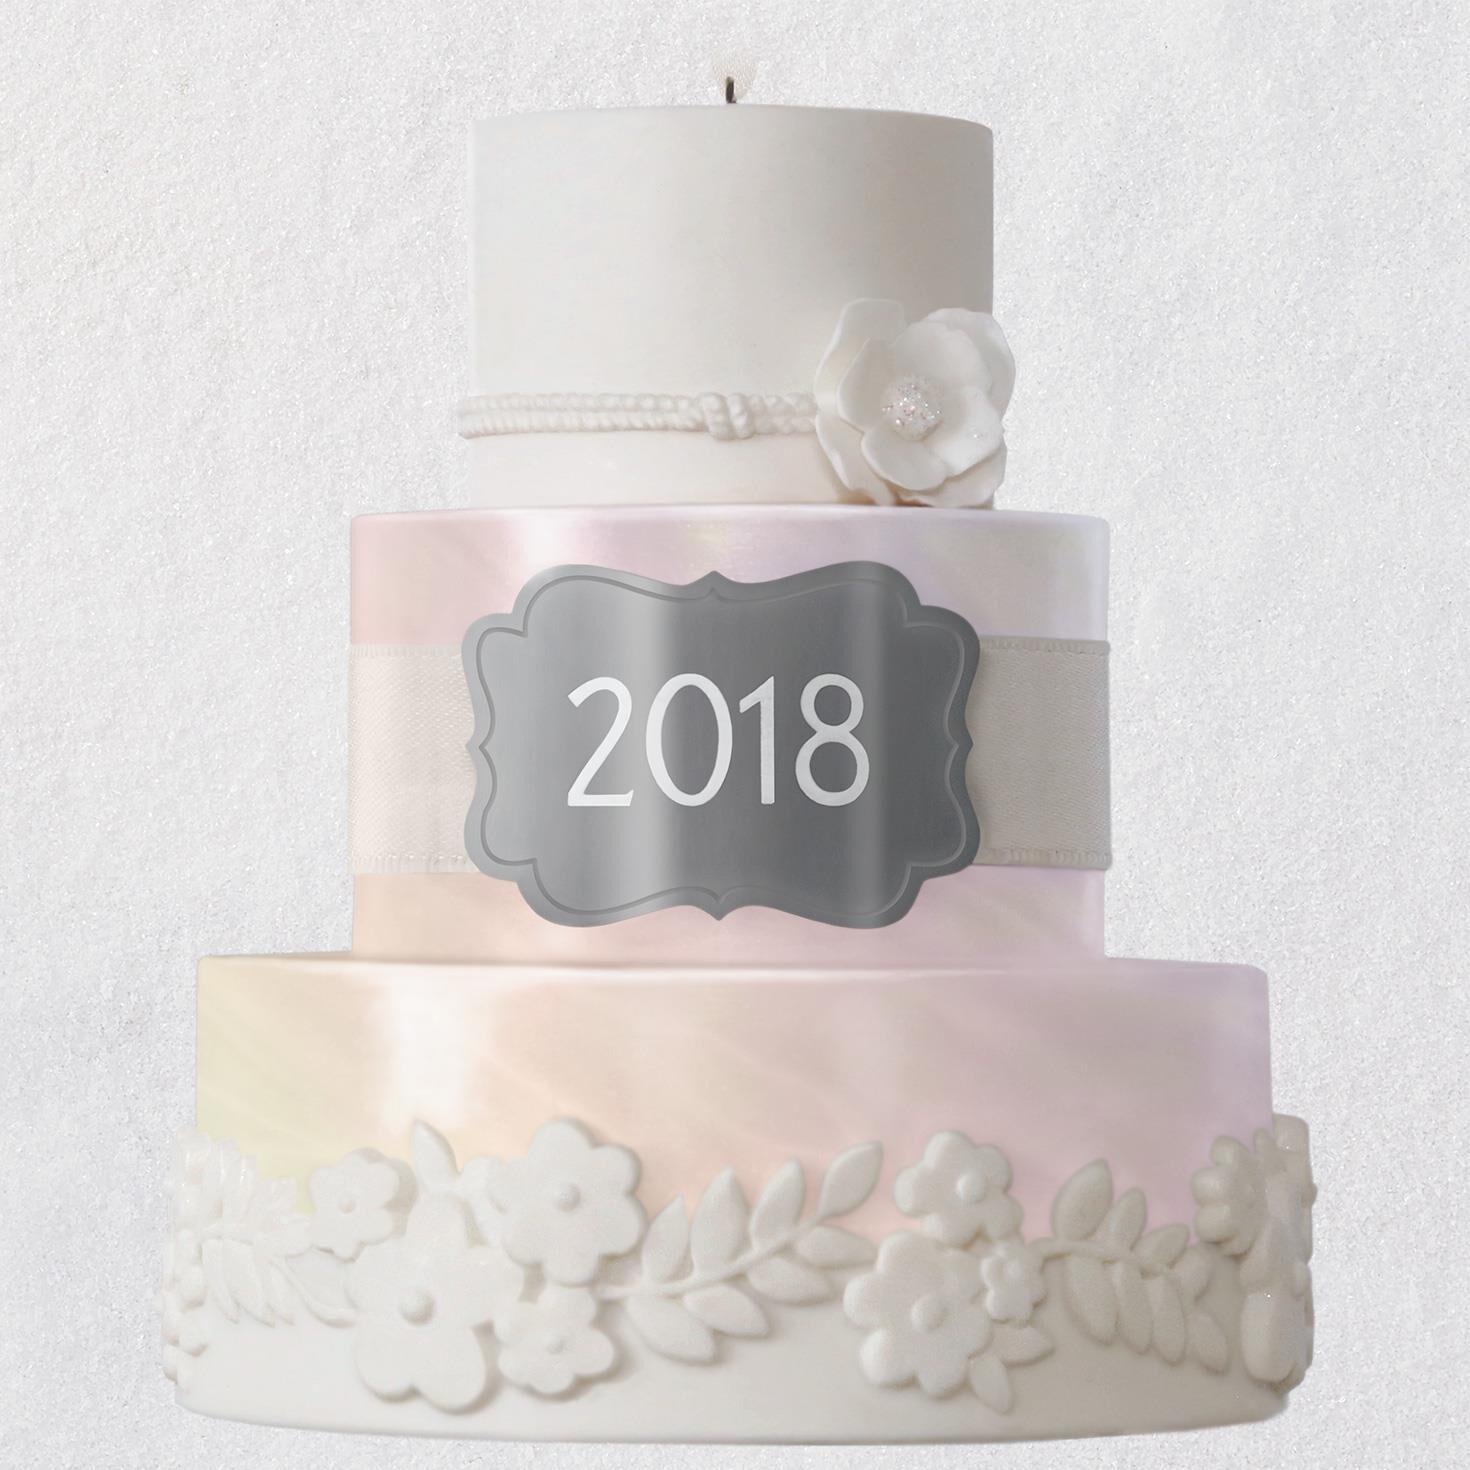 Perfect Wedding Cake Hk Image - Wedding Idea 2018 - veronikajackson.info